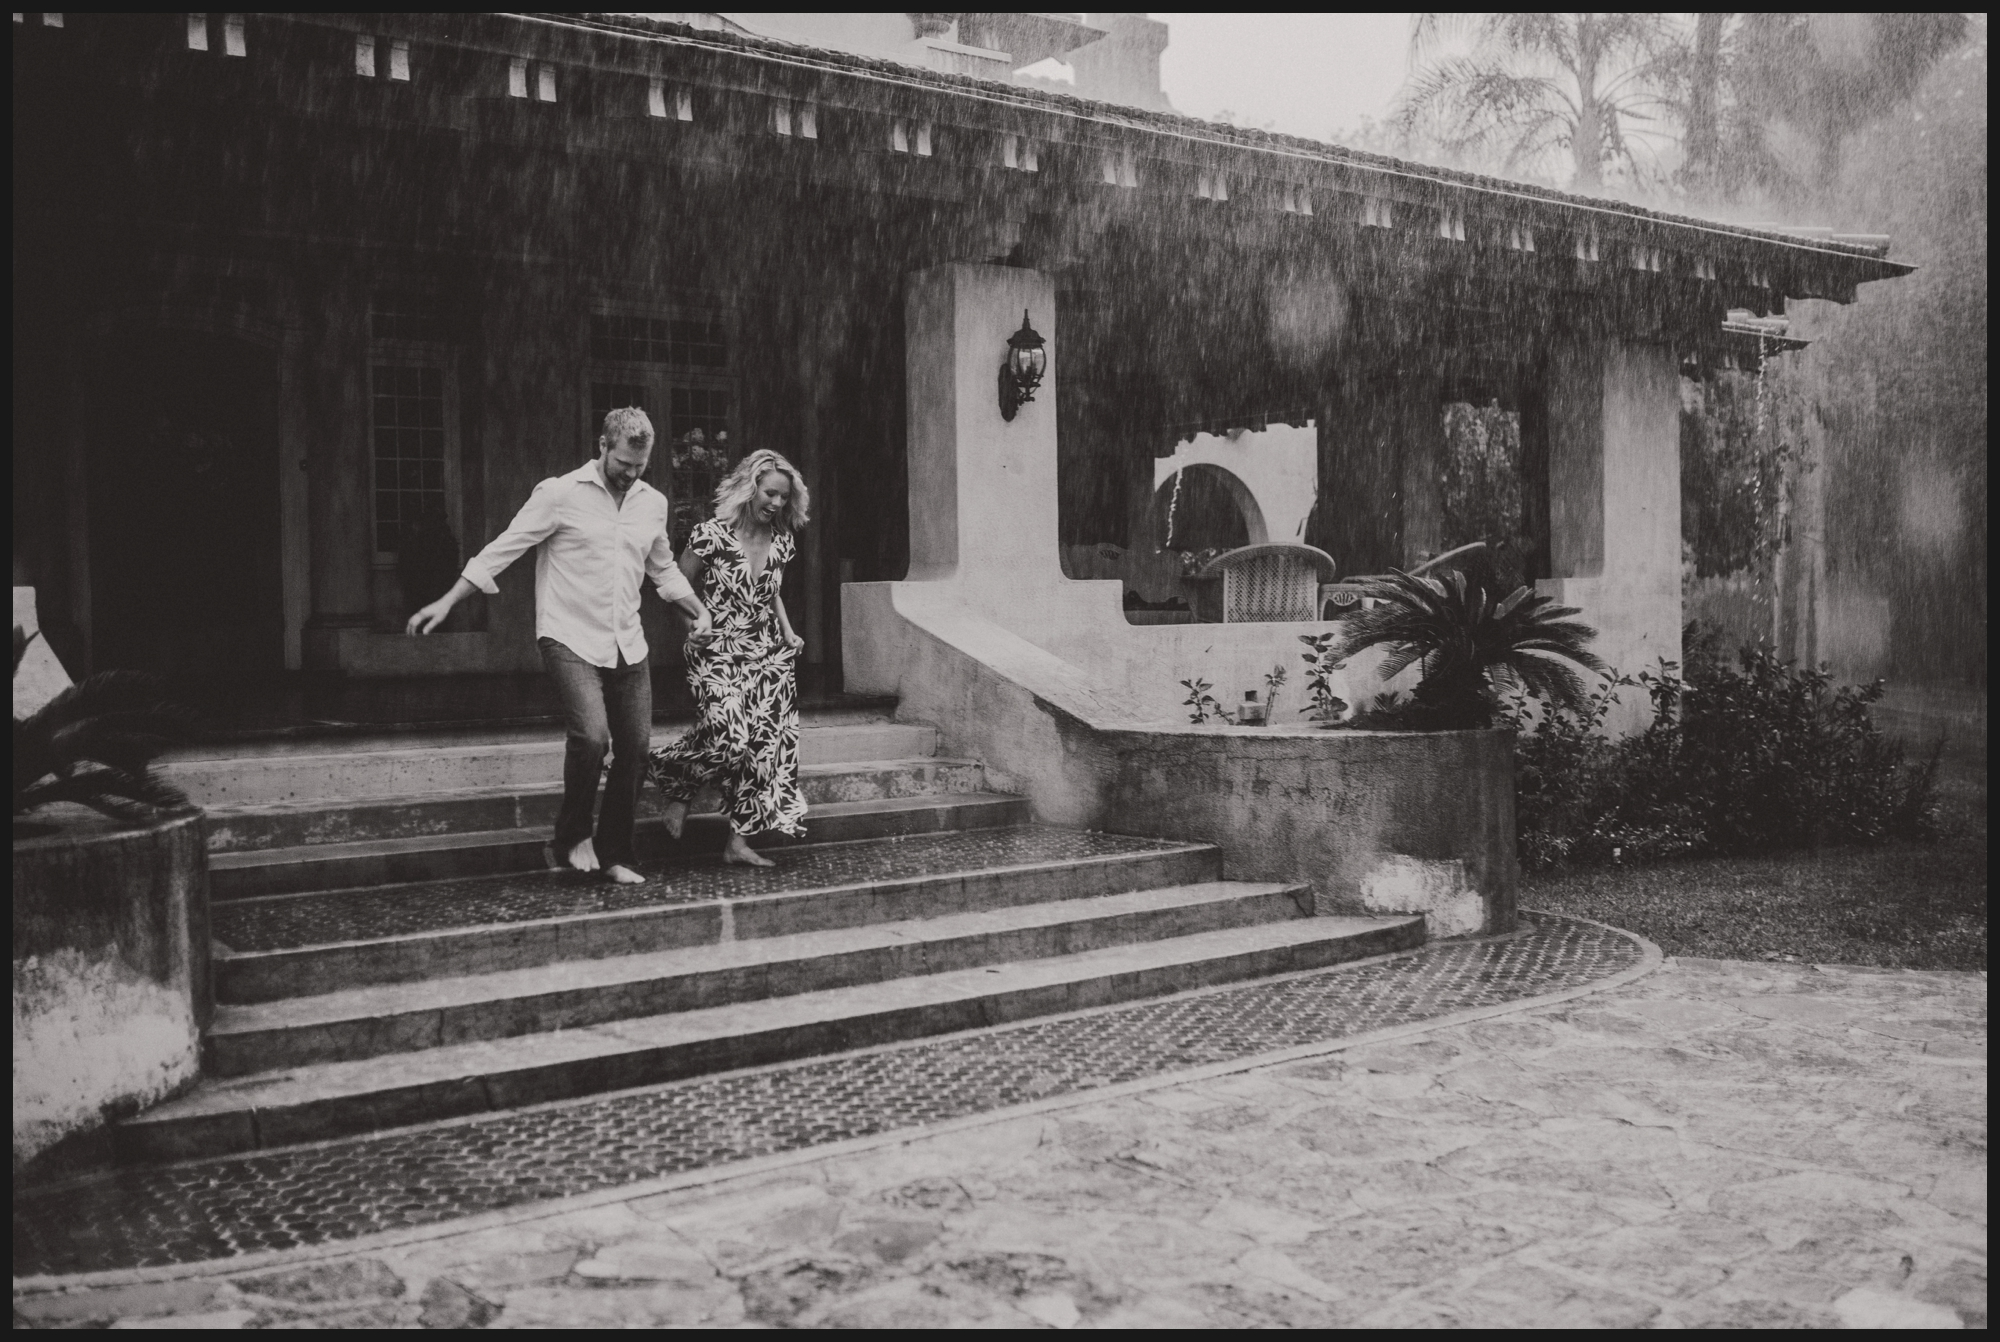 Orlando-Wedding-Photographer-destination-wedding-photographer-florida-wedding-photographer-bohemian-wedding-photographer_0213.jpg